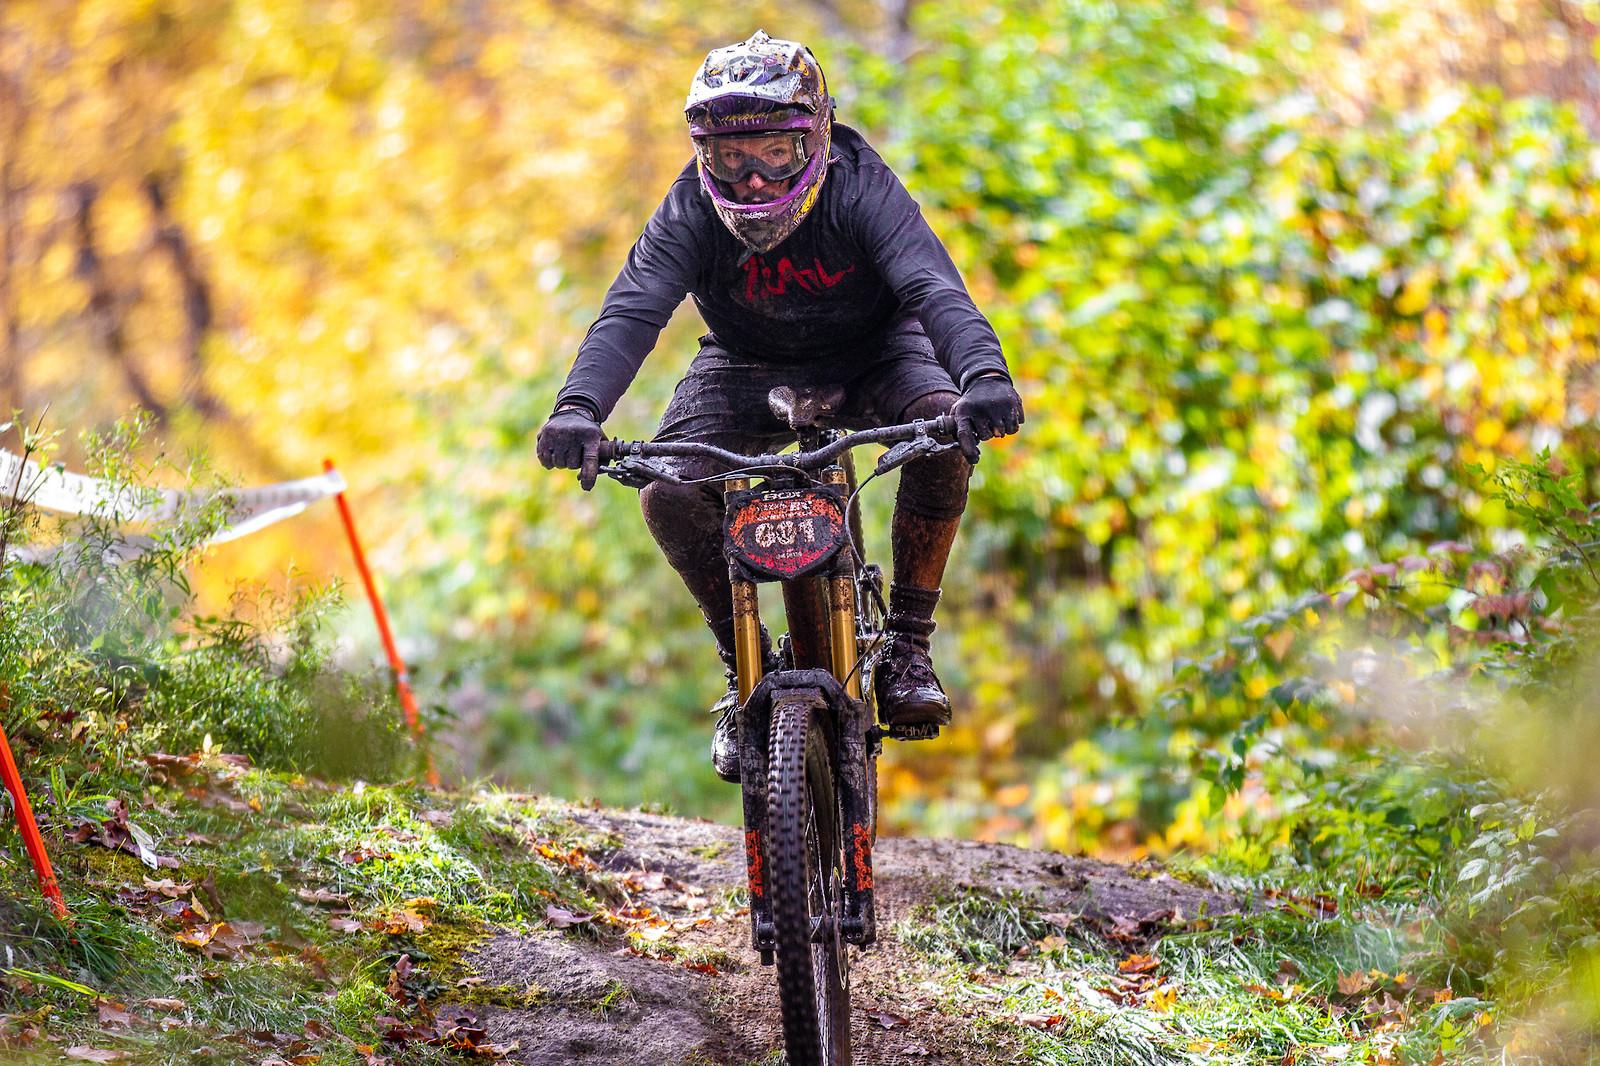 Felix-Antoine Houde - JackRice - Mountain Biking Pictures - Vital MTB